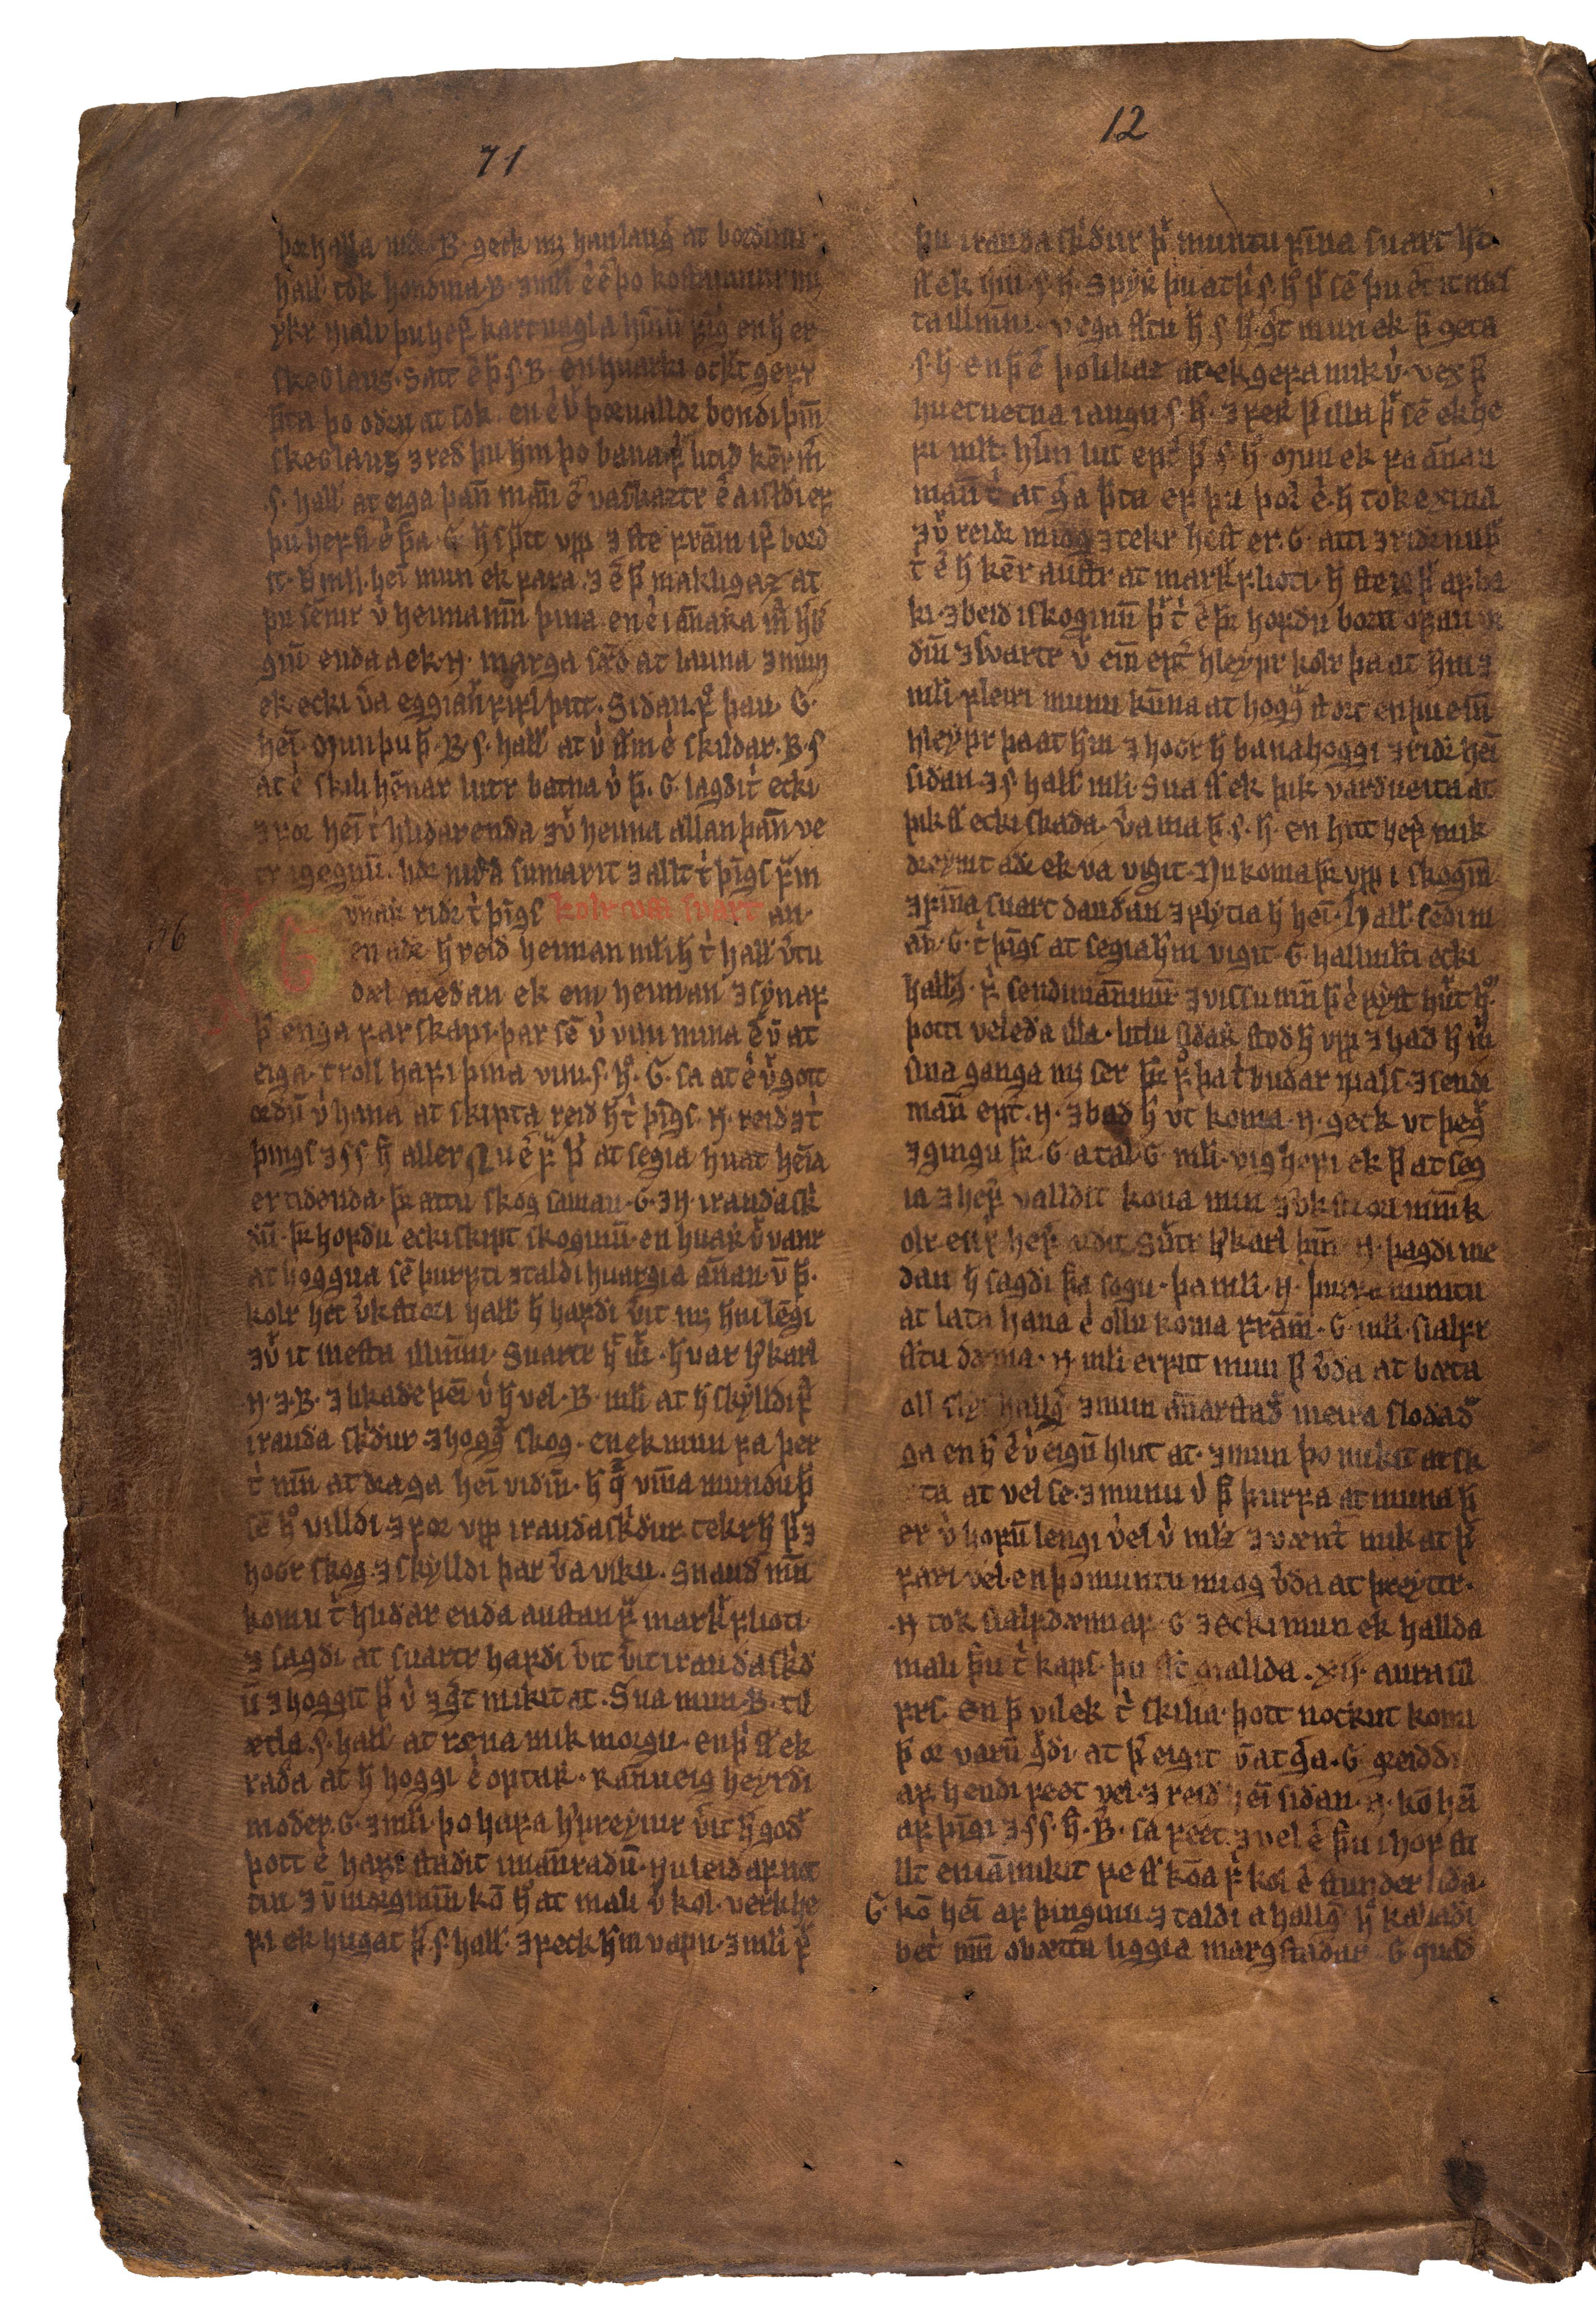 AM 132 fol - 13v